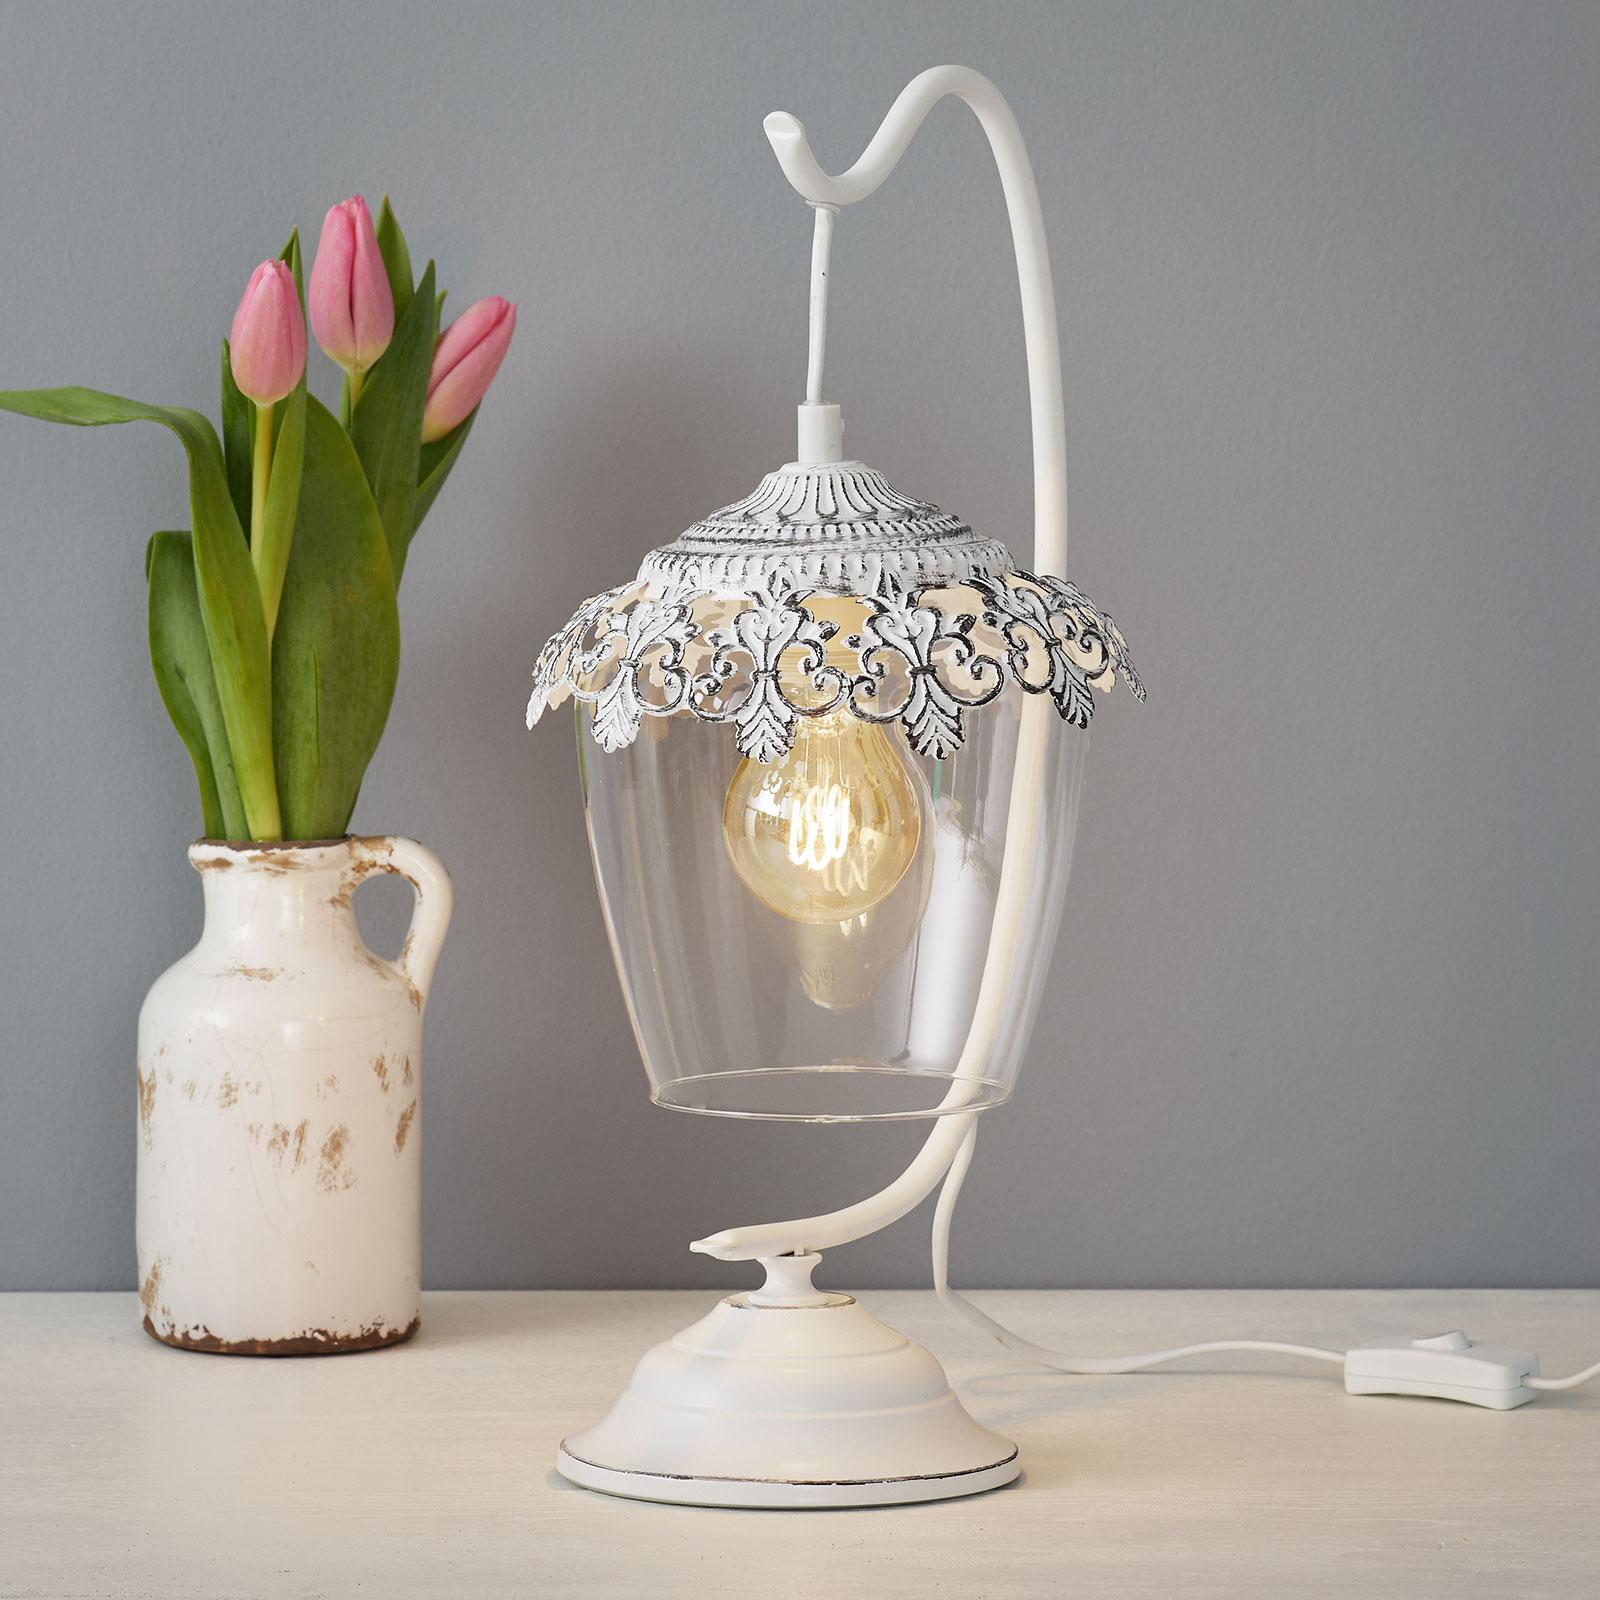 Hvitpatinert bordlampe Florinia